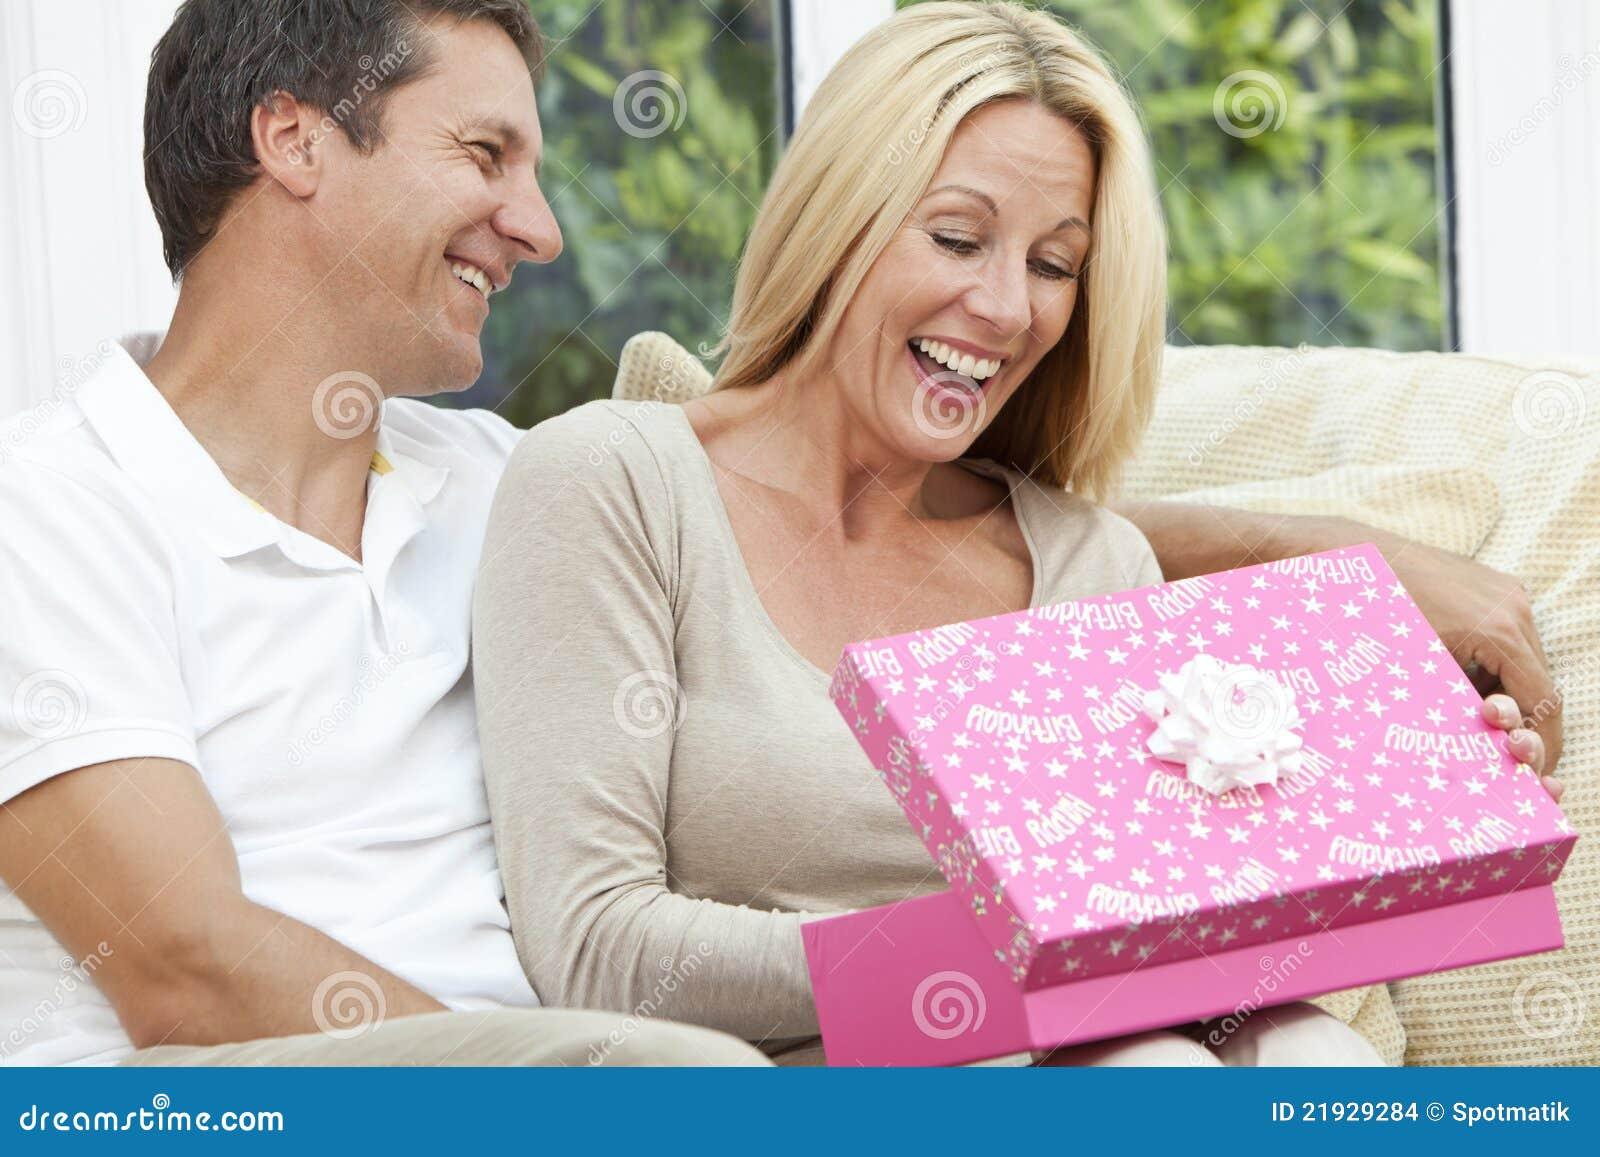 happy-man-woman-couple-opening-birthday-